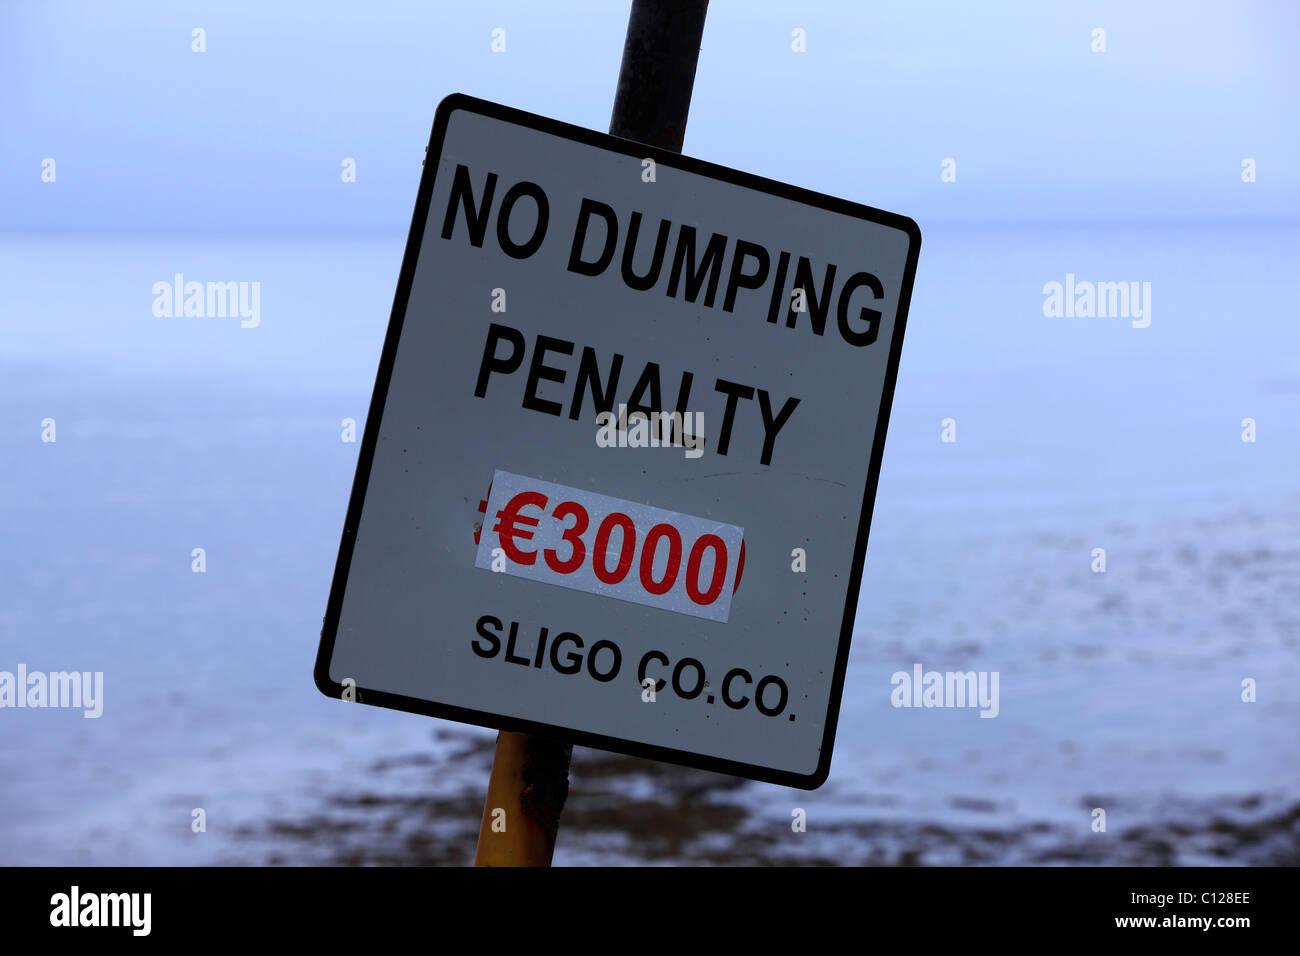 € 3000 No Dumping Penalty Sign,County Sligo, Ireland - Stock Image